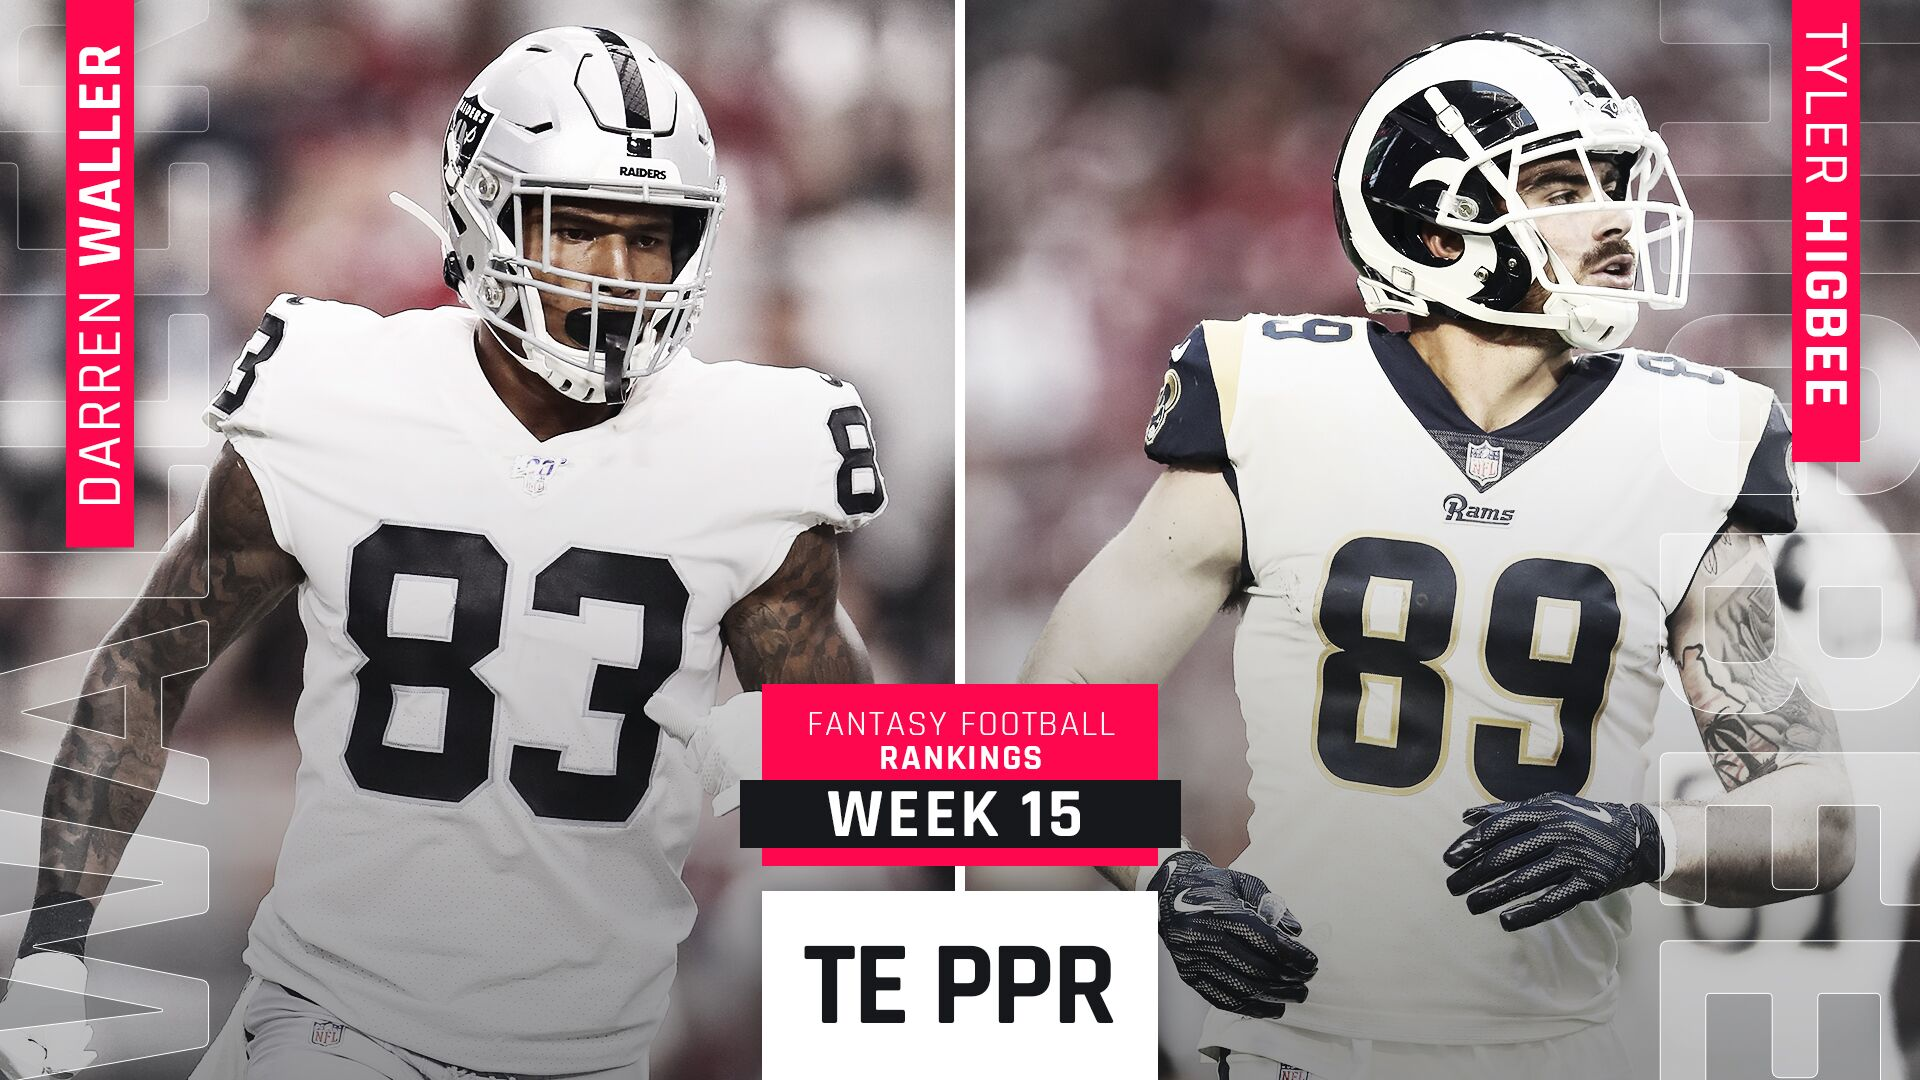 Week 15 Fantasy PPR Rankings: Tight end